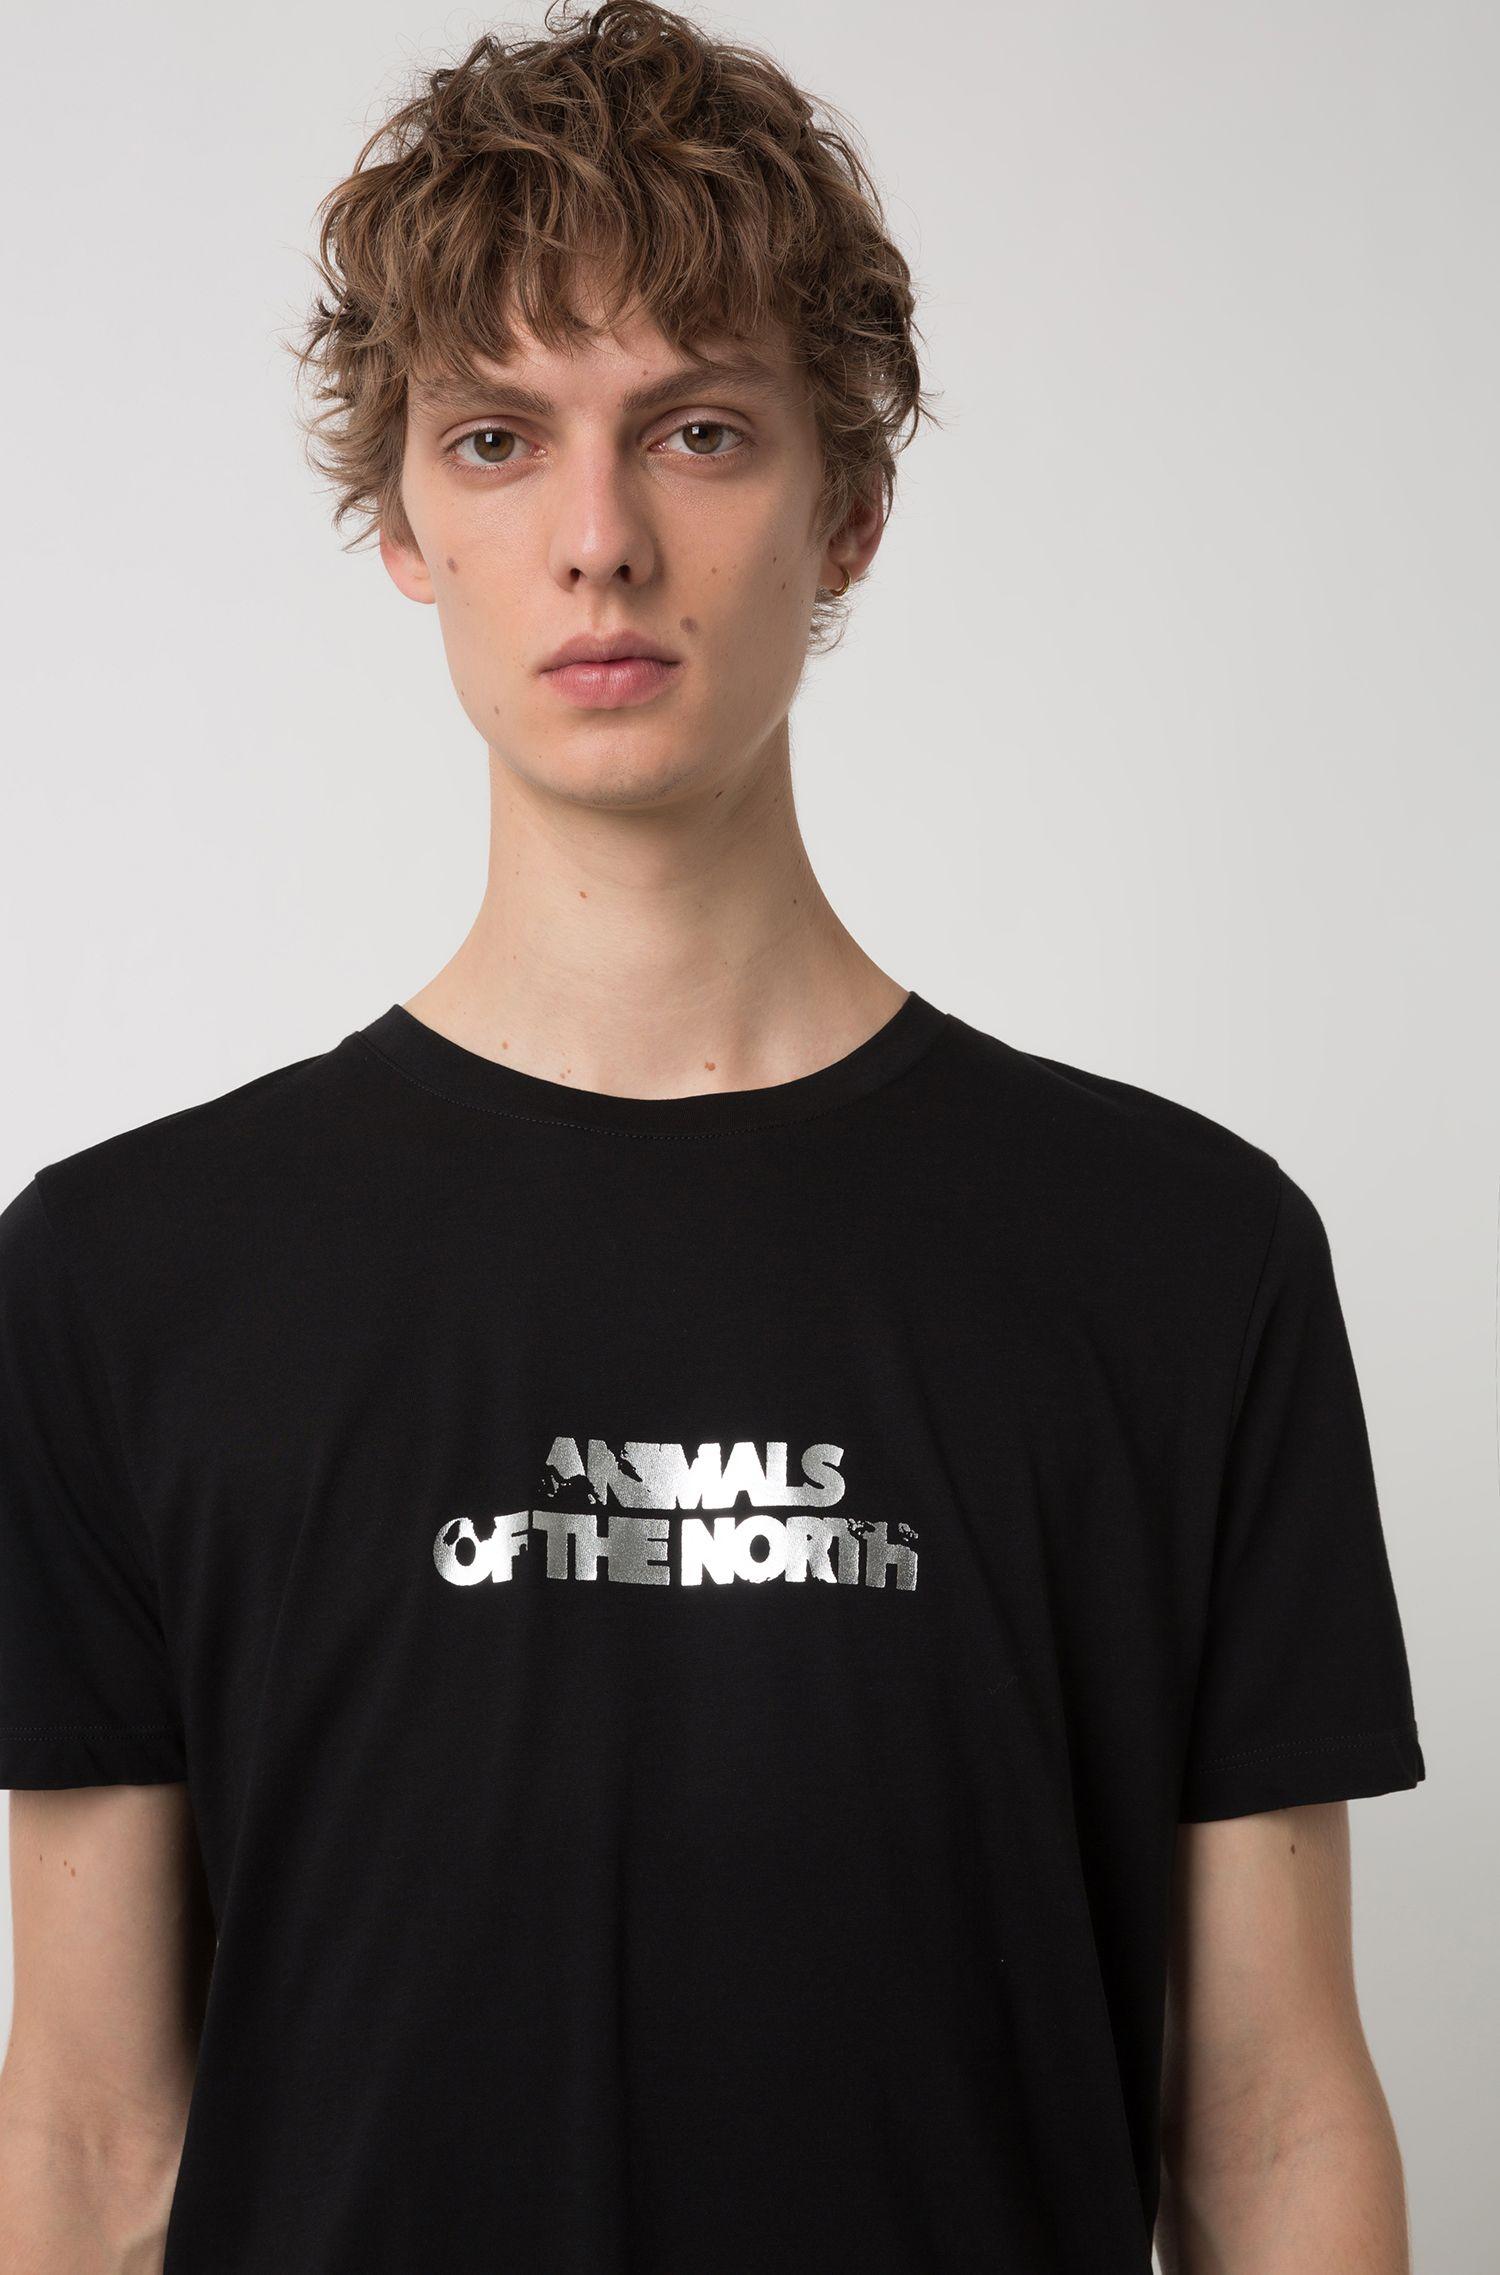 Single-jersey T-shirt with printed metallic slogan, Black